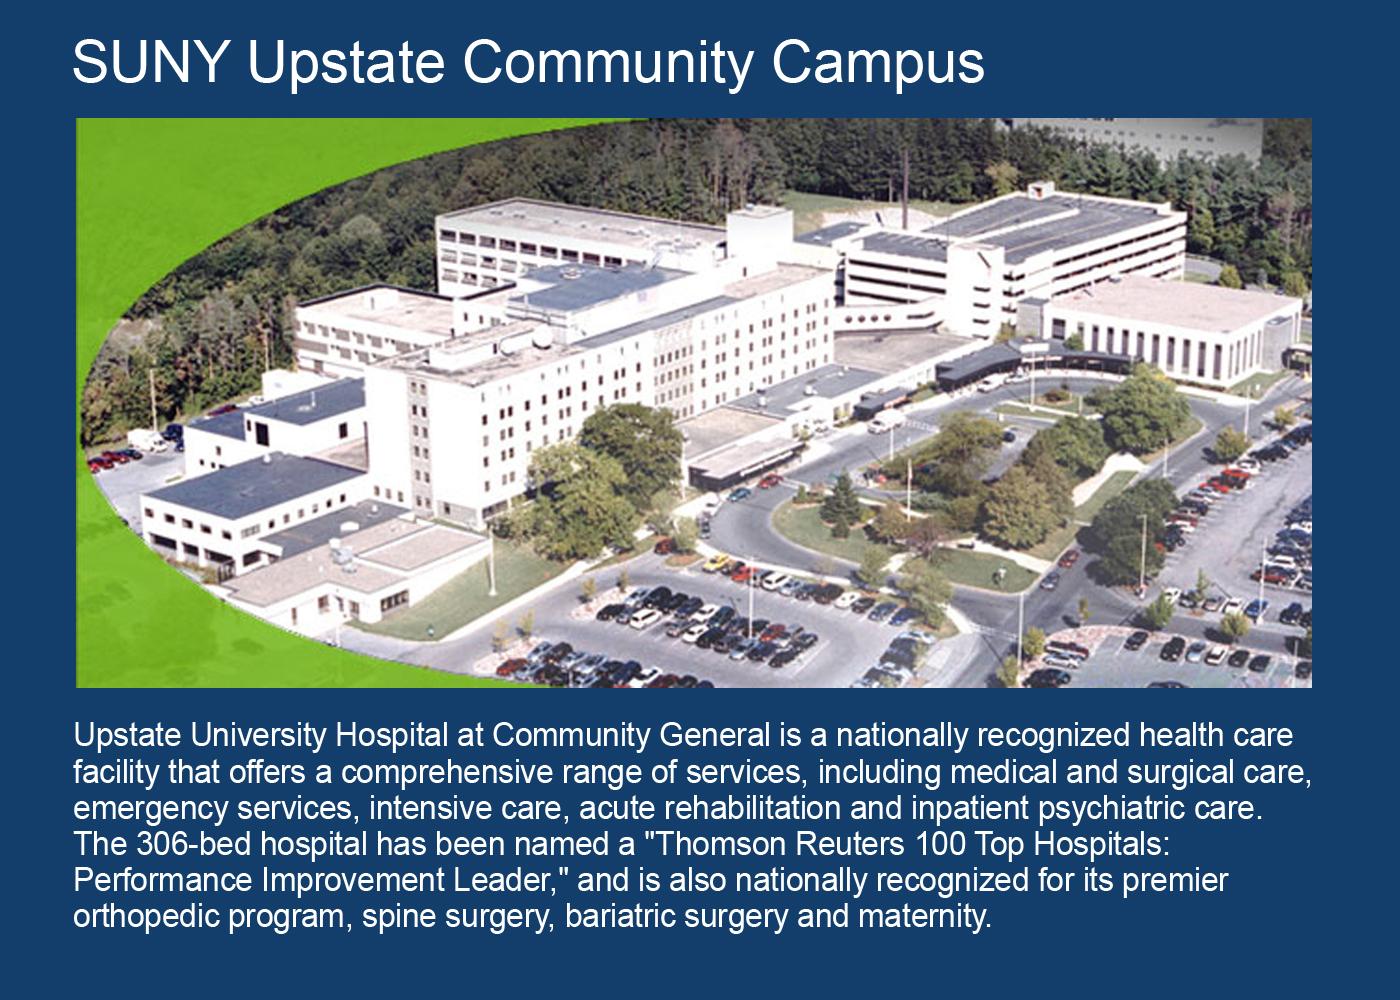 SUNY Upstate Community